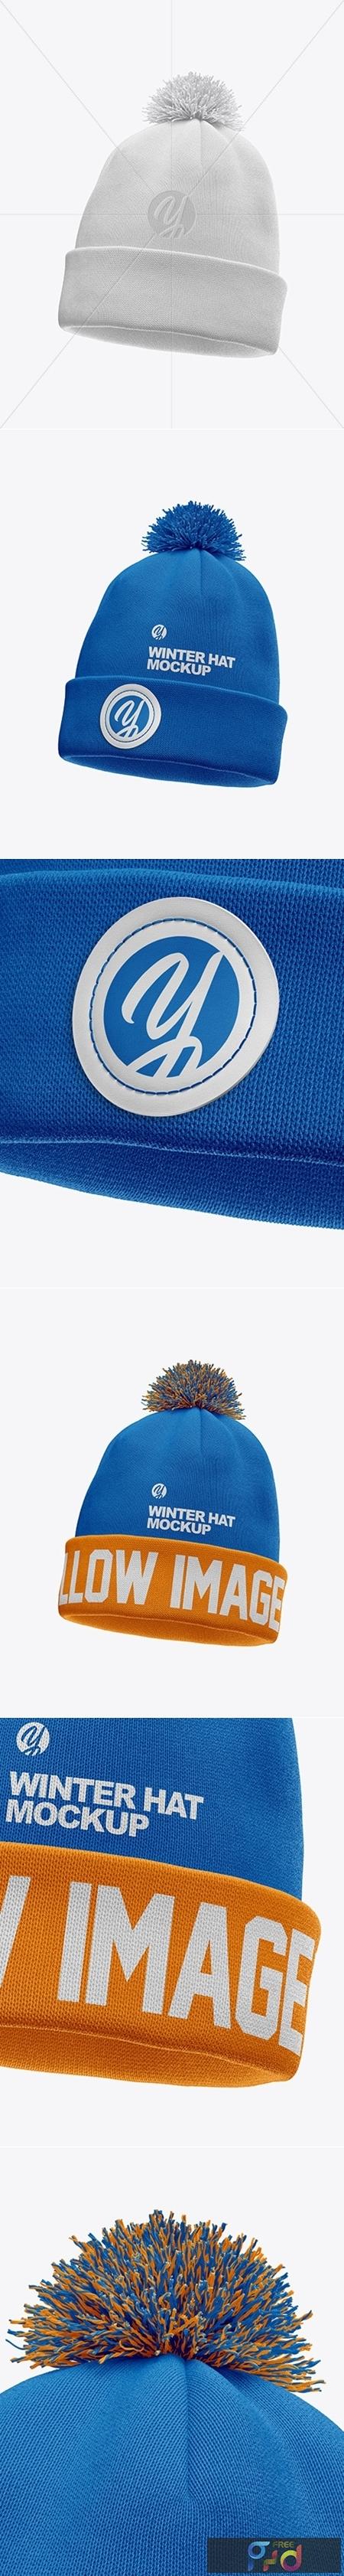 Winter Hat Mockup - Half Side View 51621 1